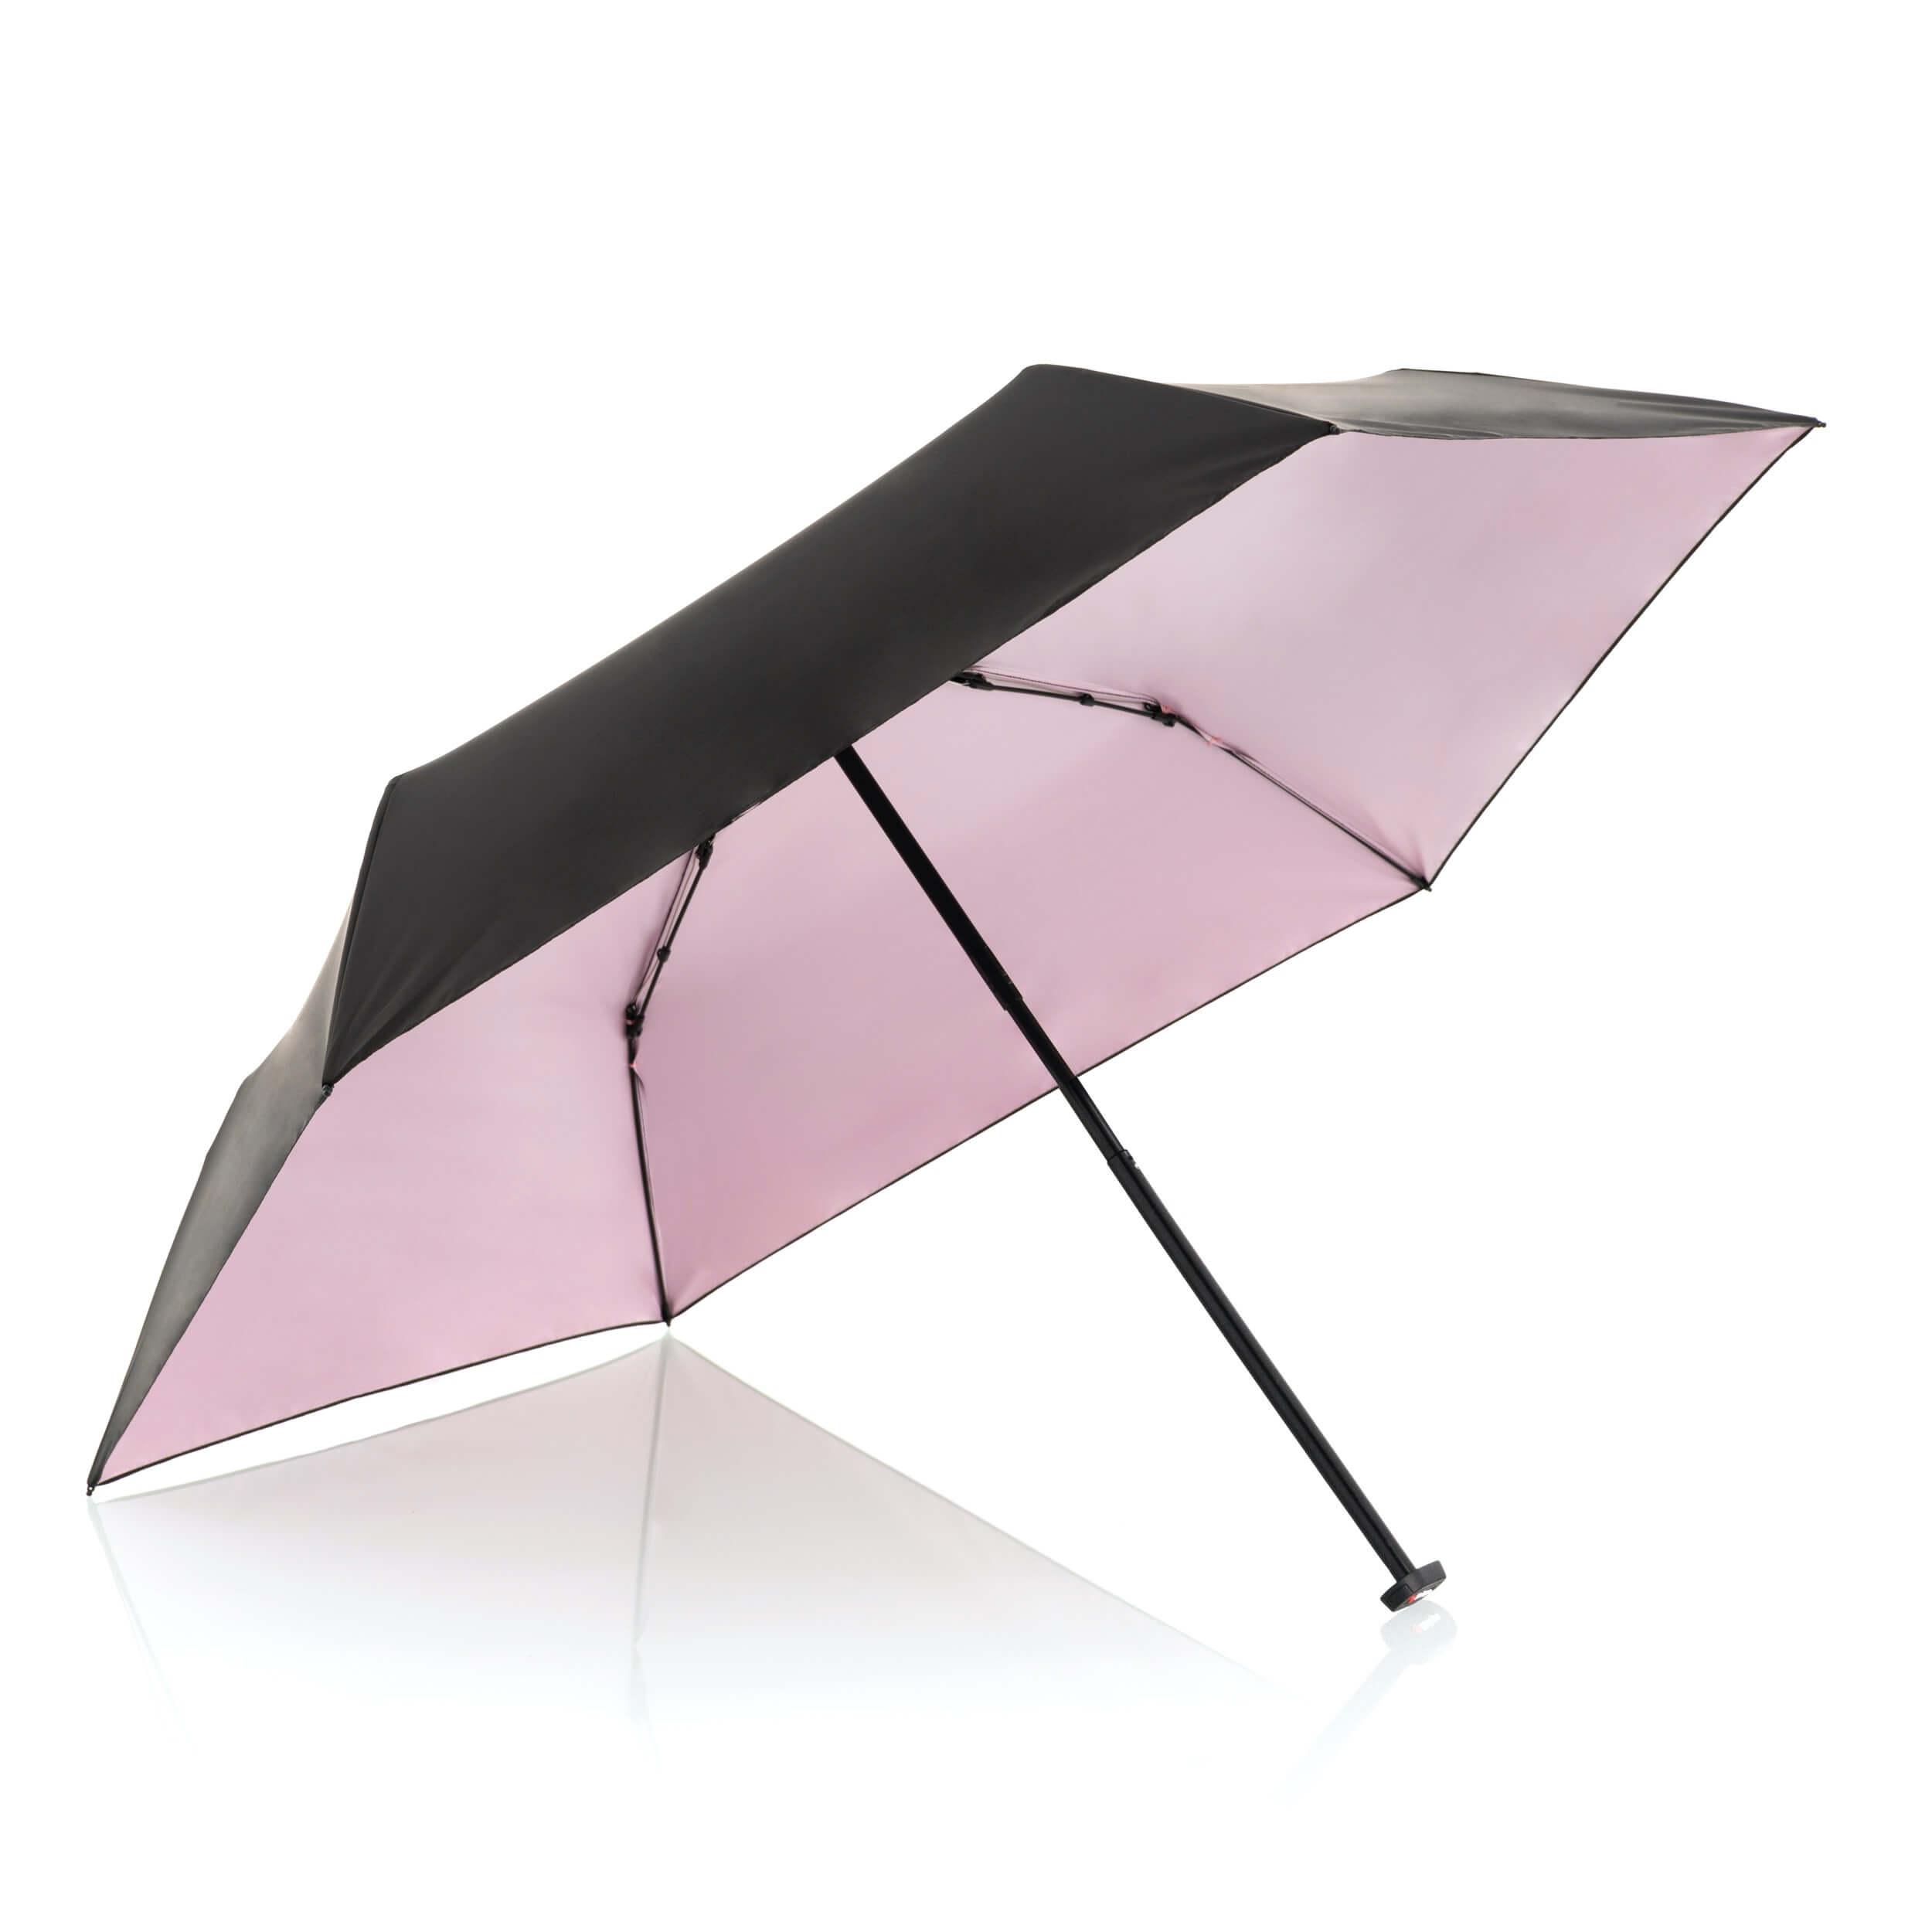 Knirps Paraplu Ultra Light Slim Black with Rosé